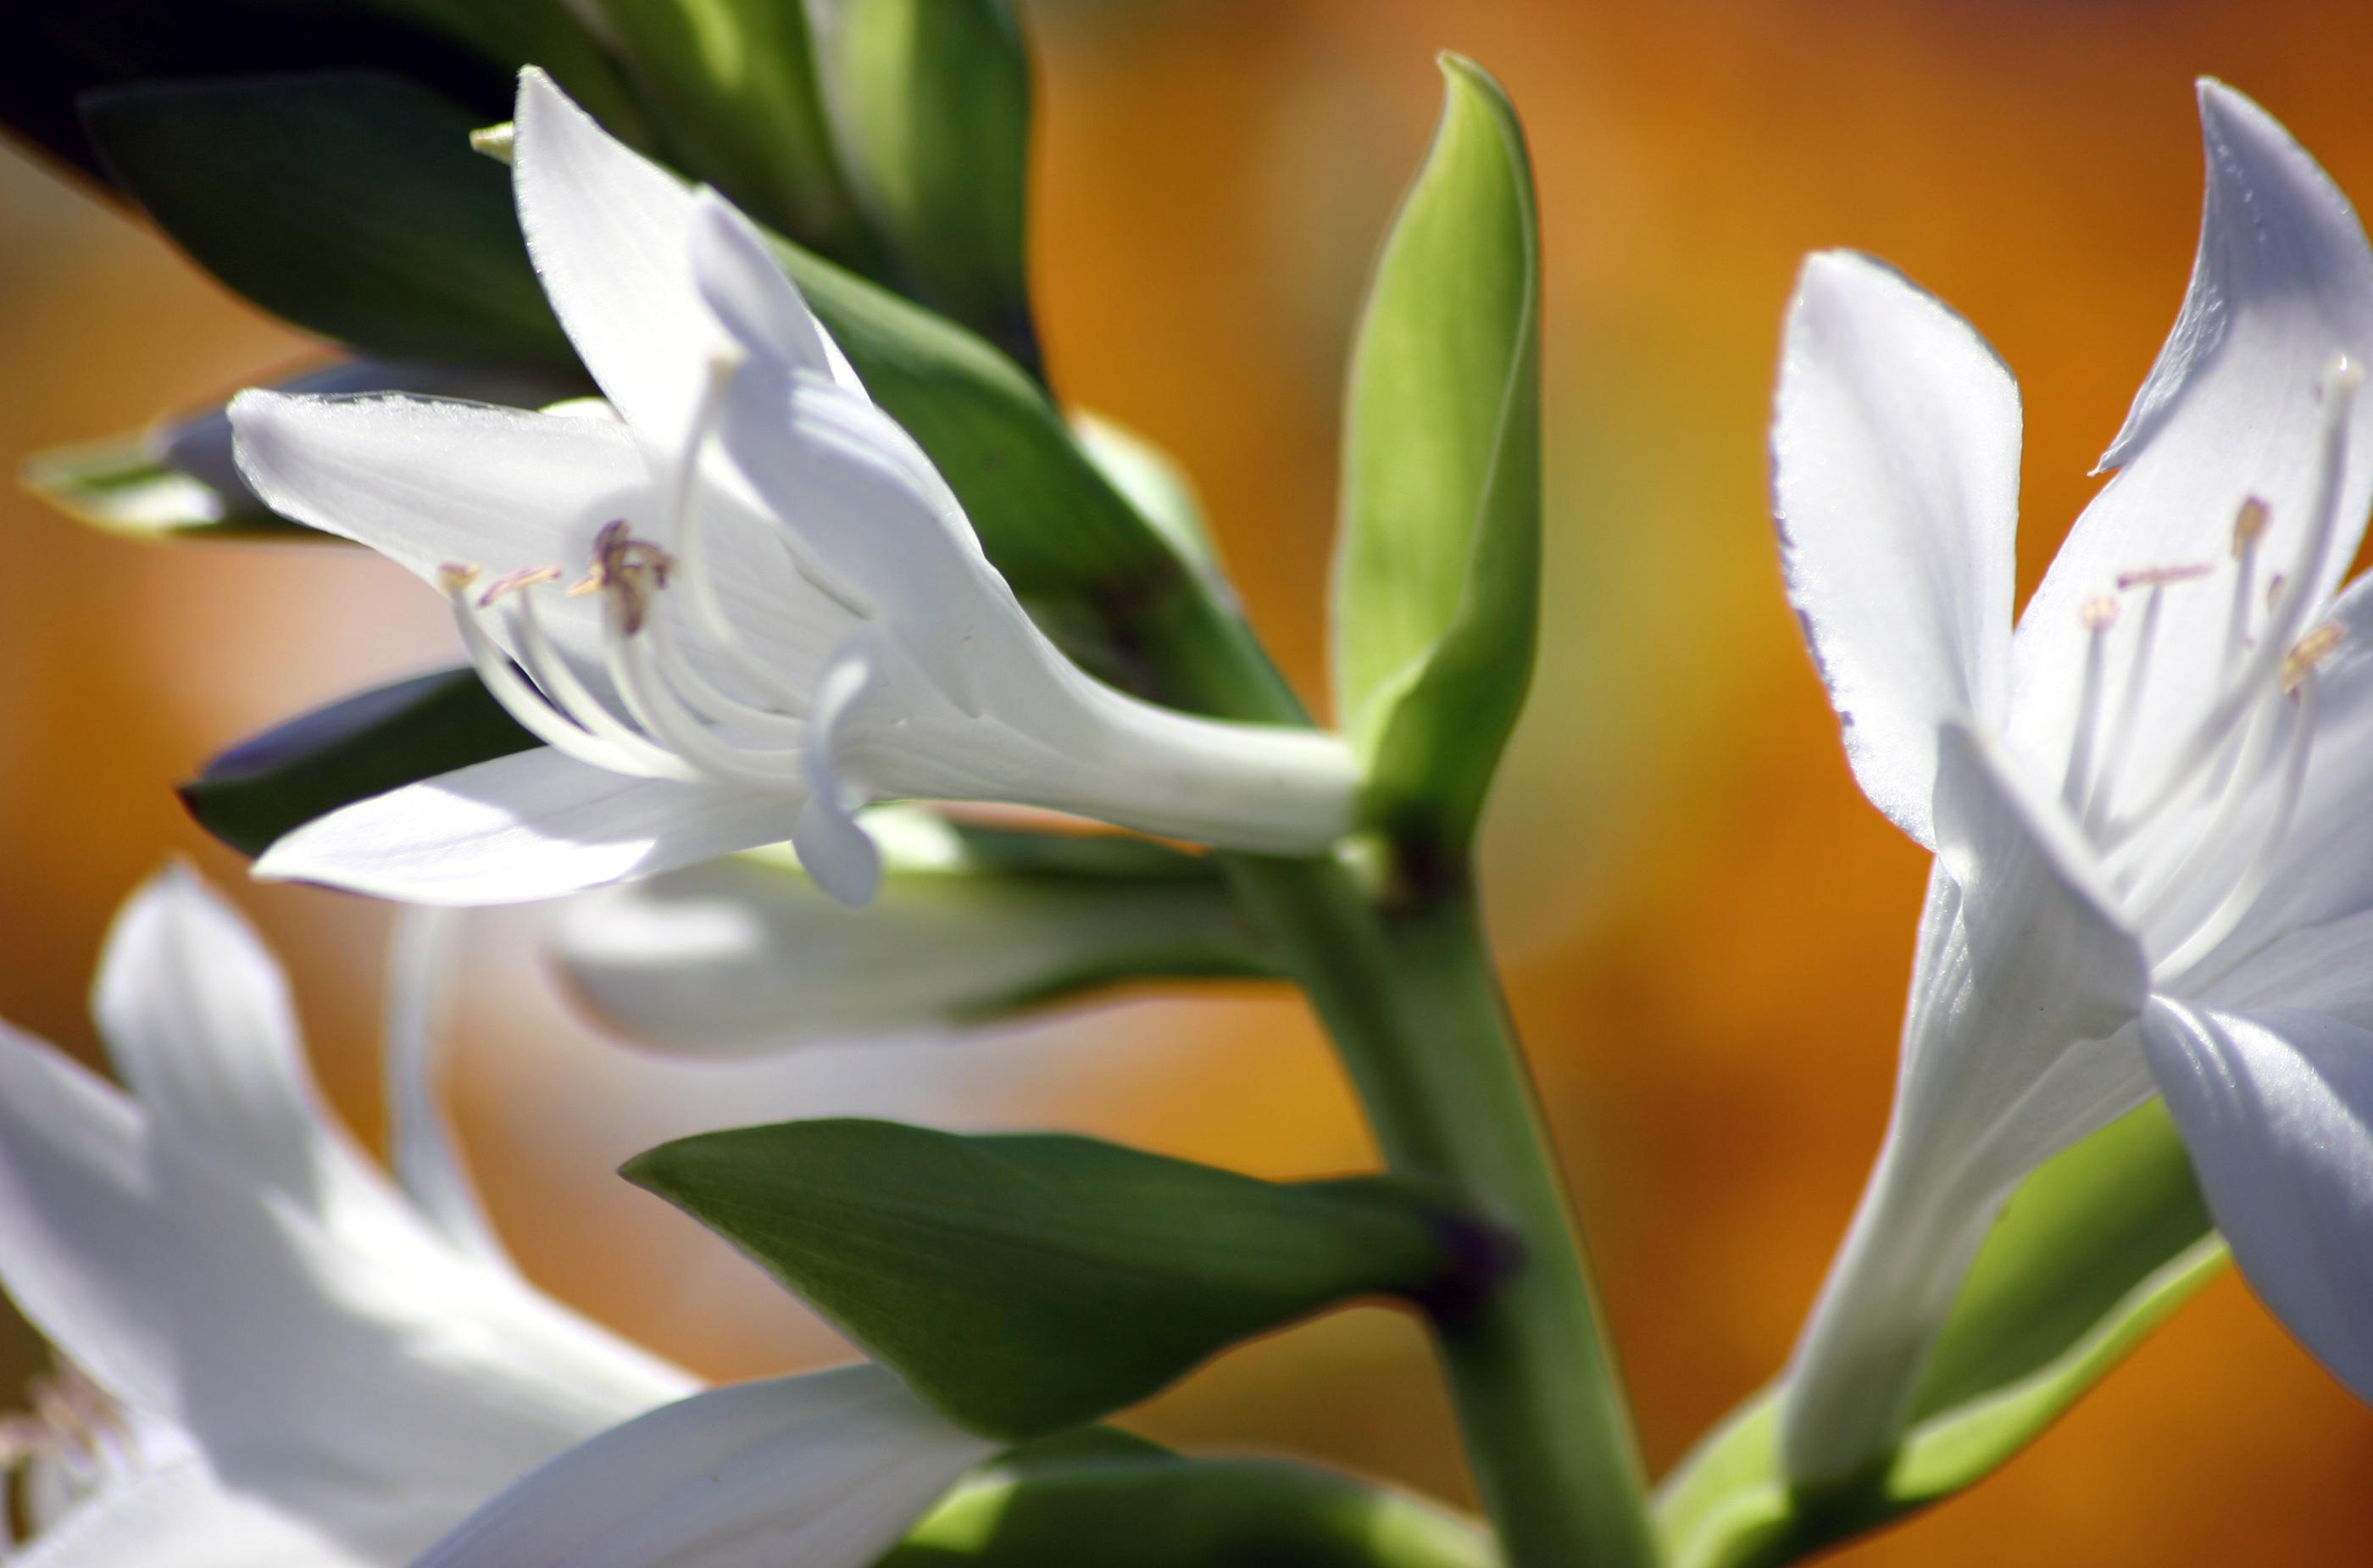 Hydrolat de fleurs d'oranger